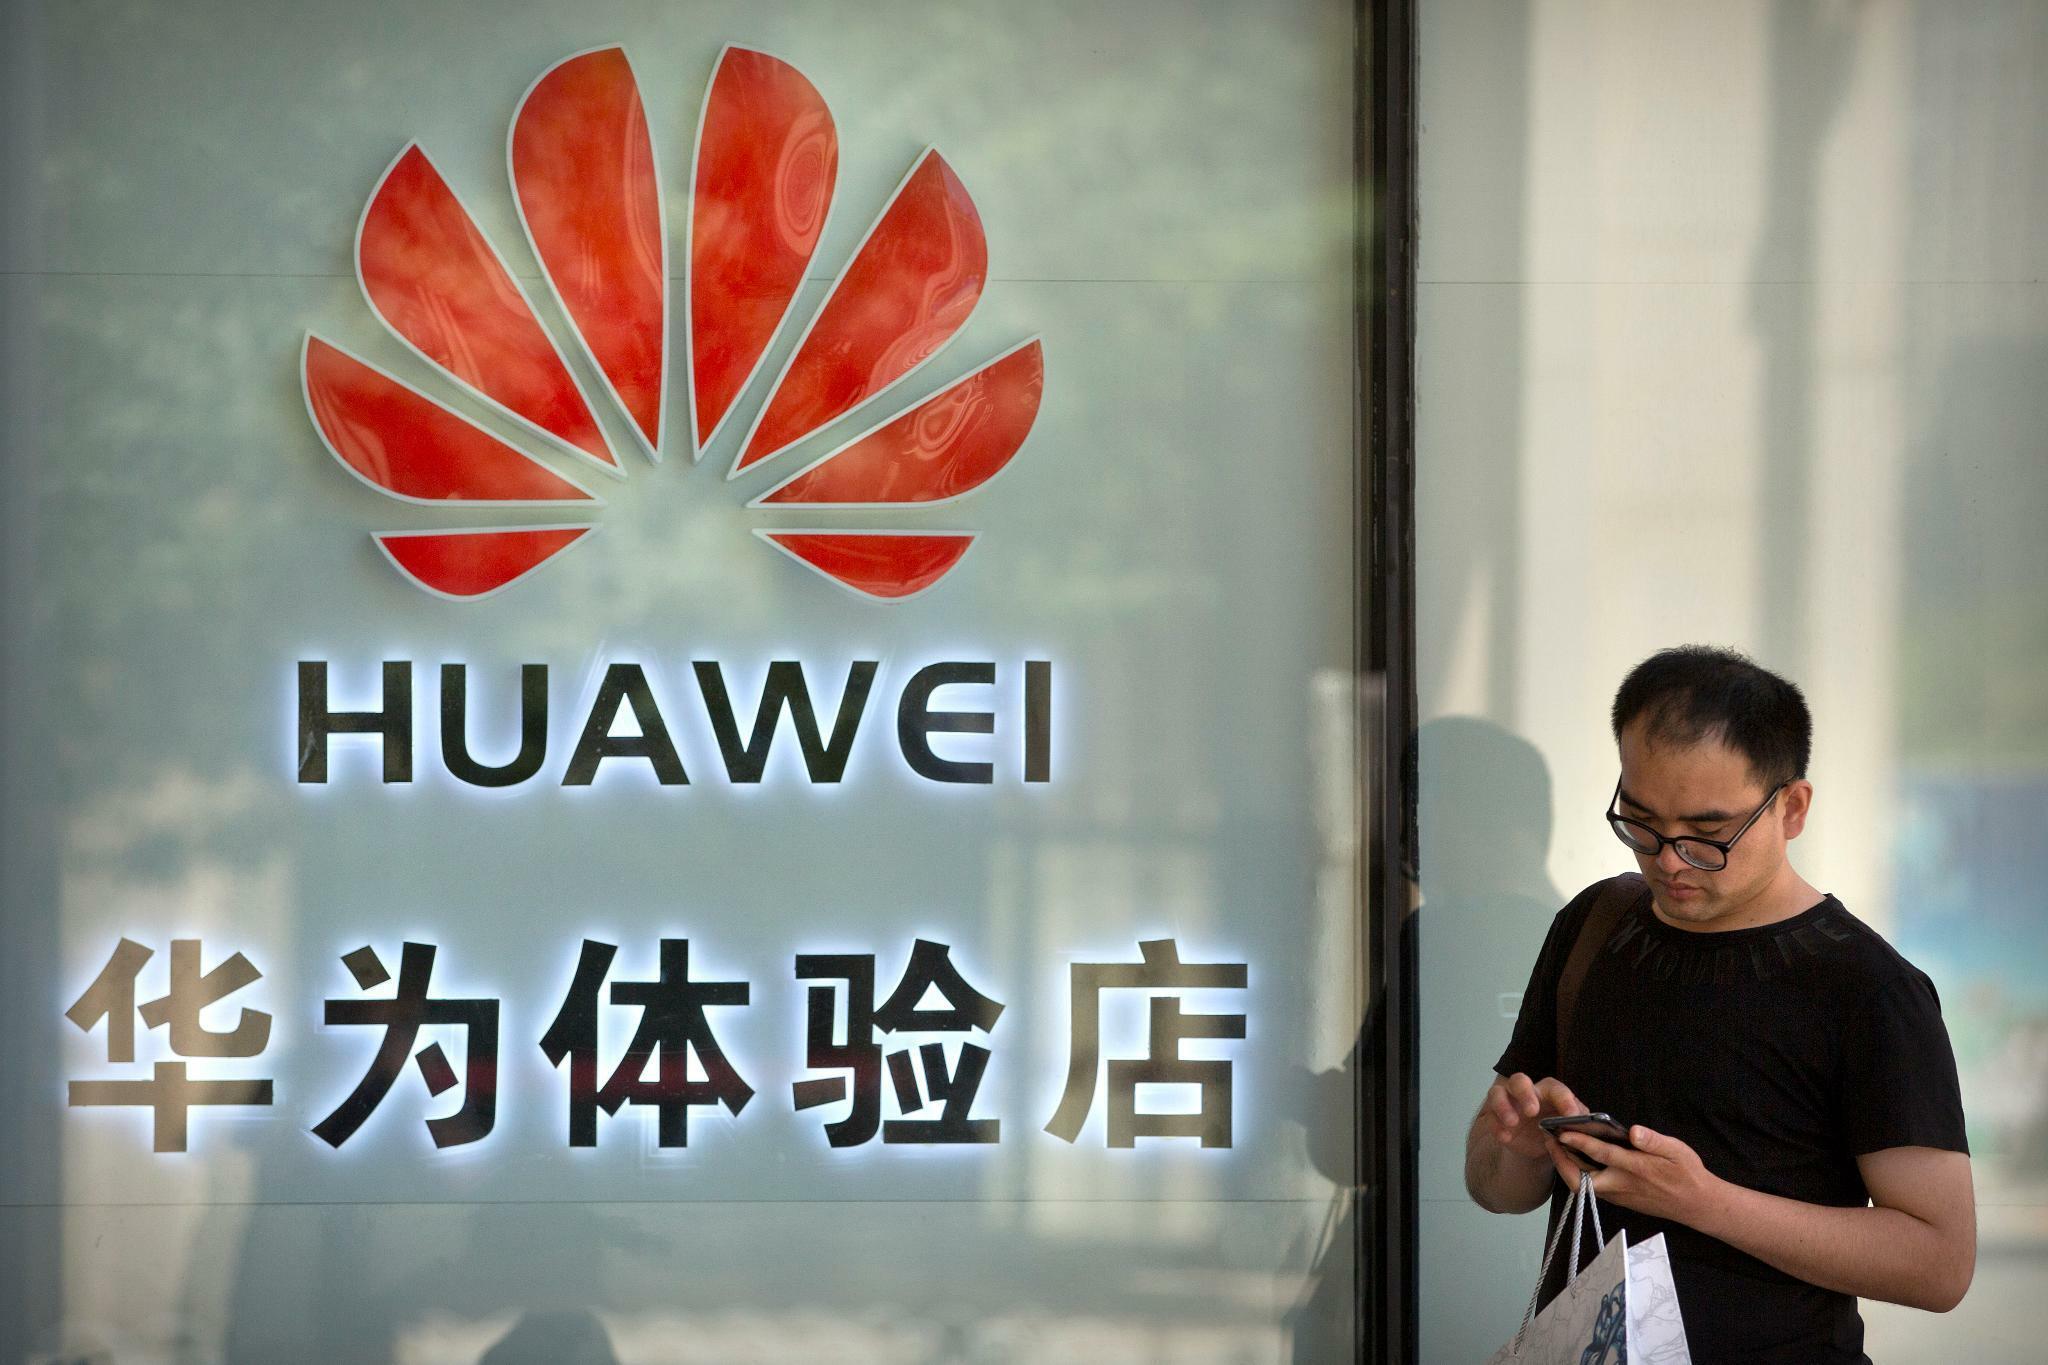 Neuer Mobilfunkstandard: Huawei begrüßt Zulassung zum 5G-Ausbau in Deutschland